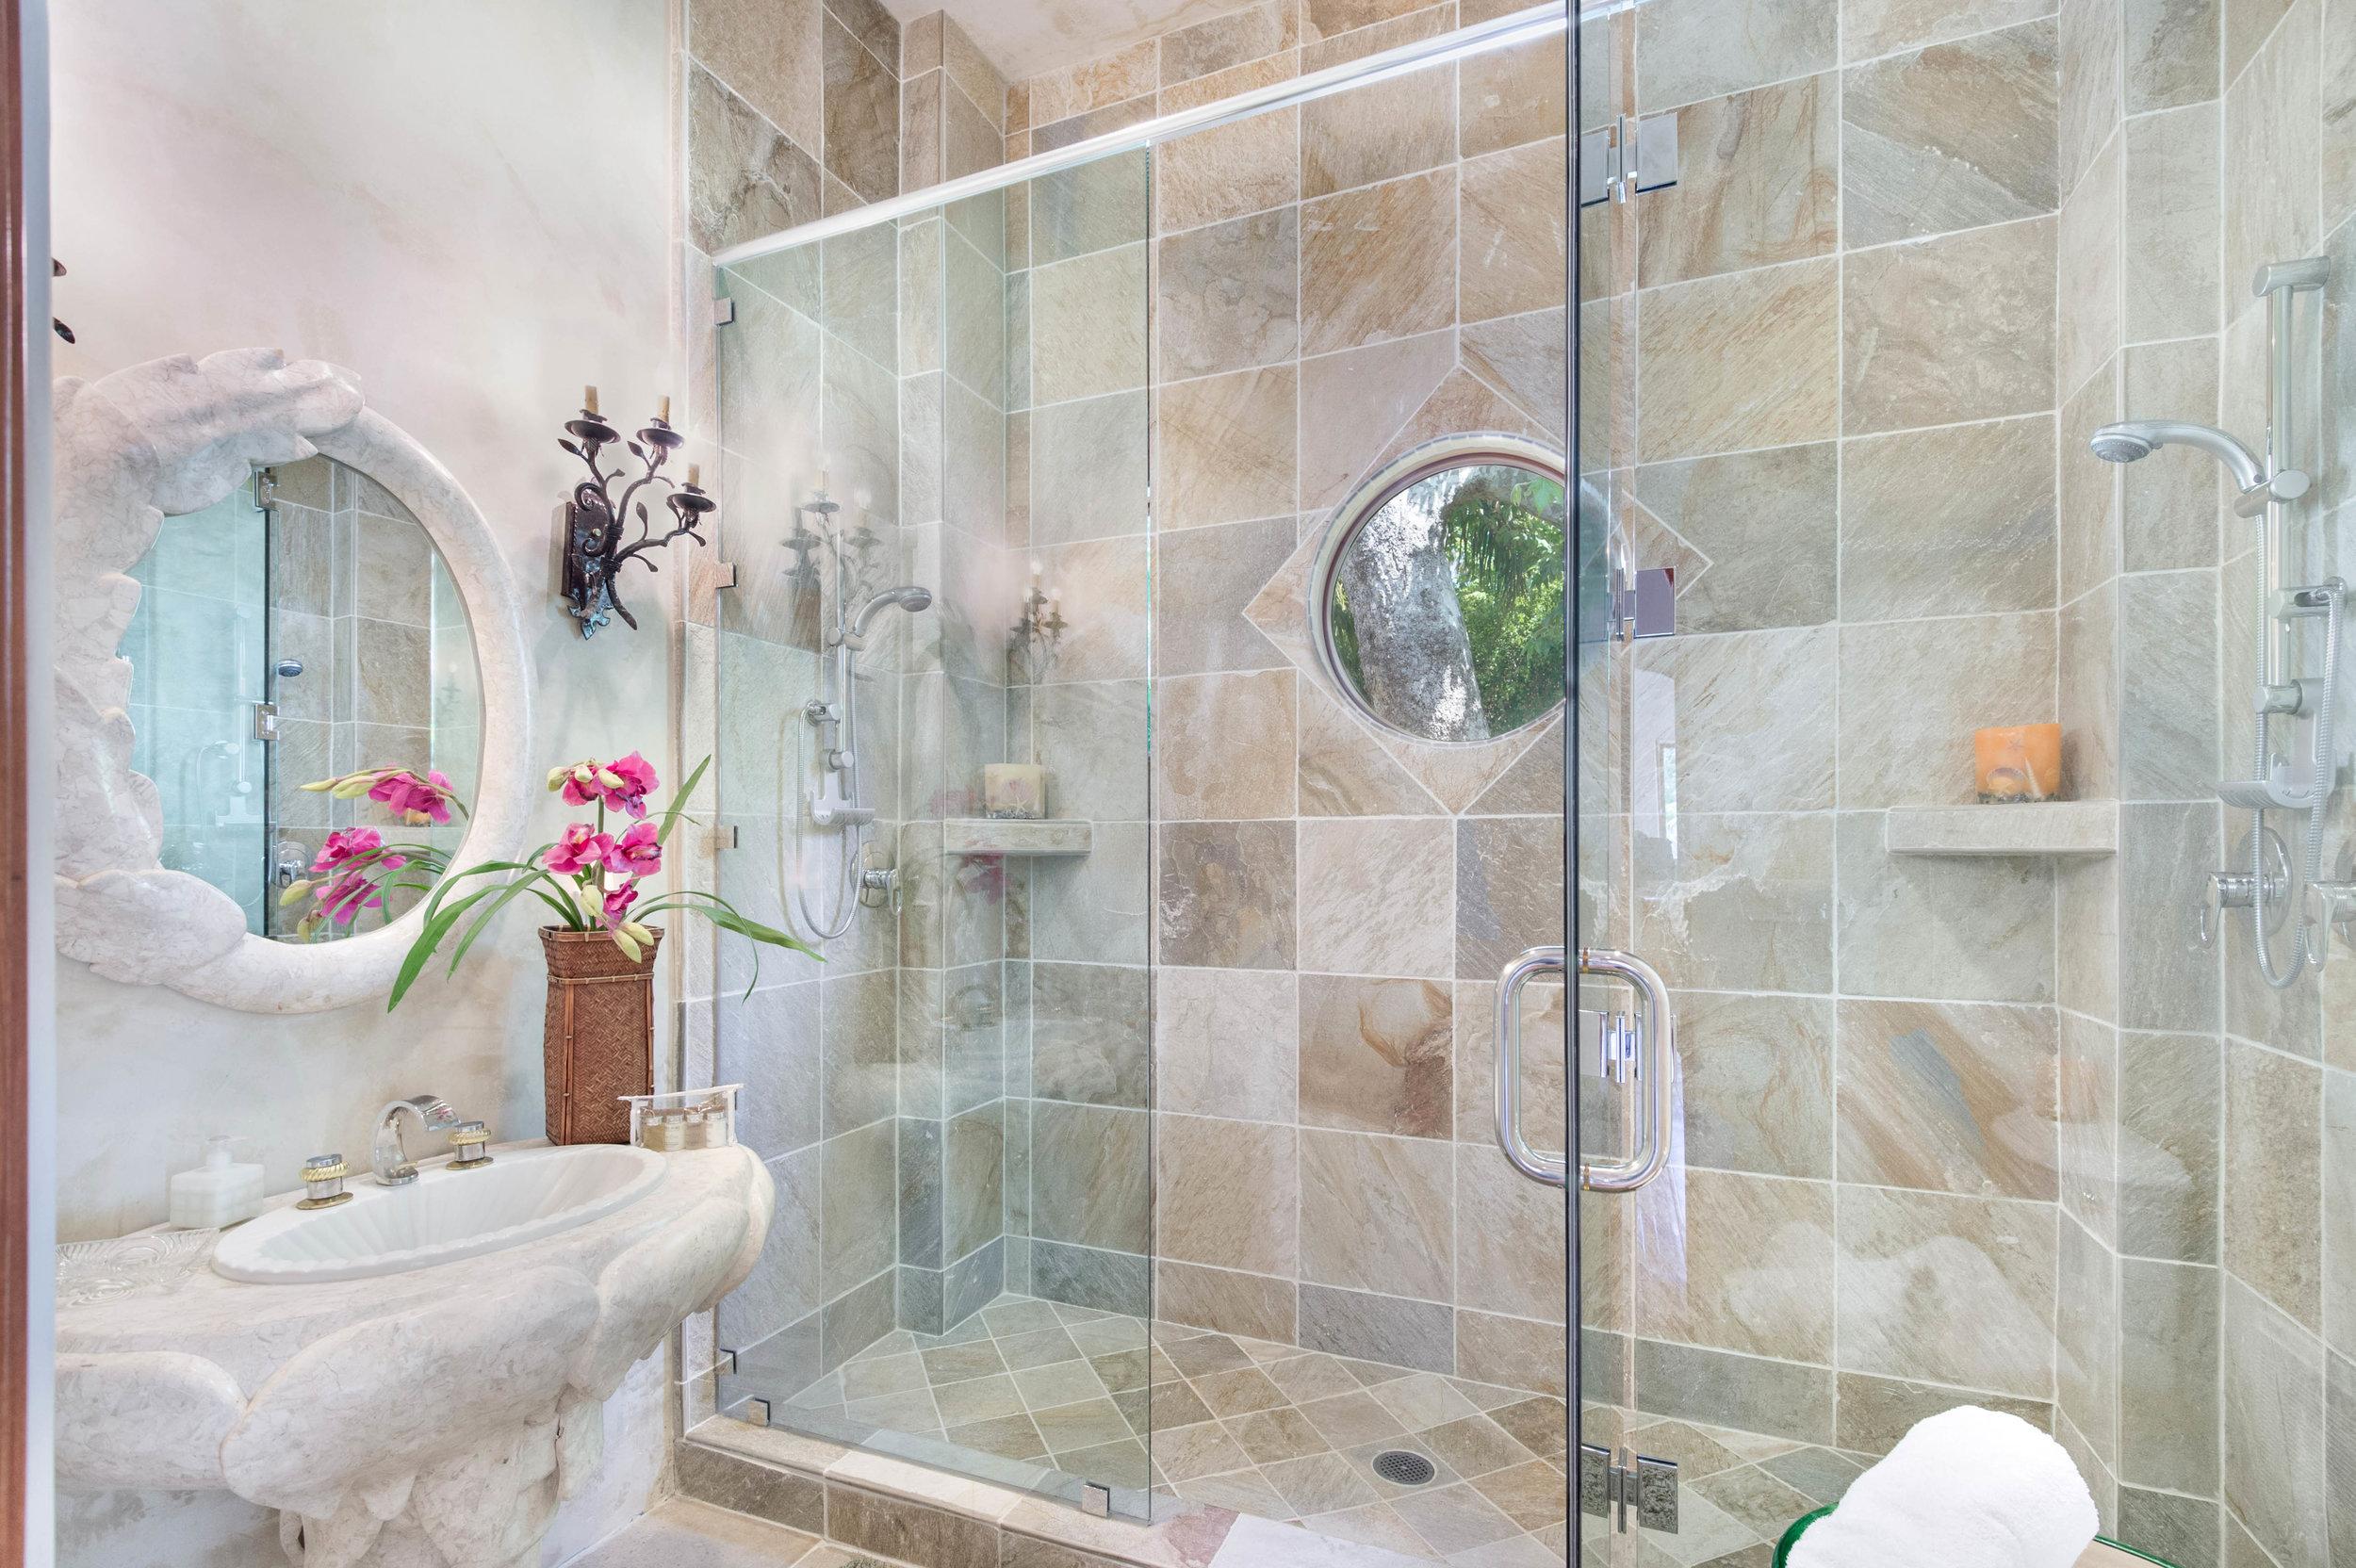 018 guest bathroom 6405 bonsall Malibu For Sale The Malibu Life Team Luxury Real Estate.jpg